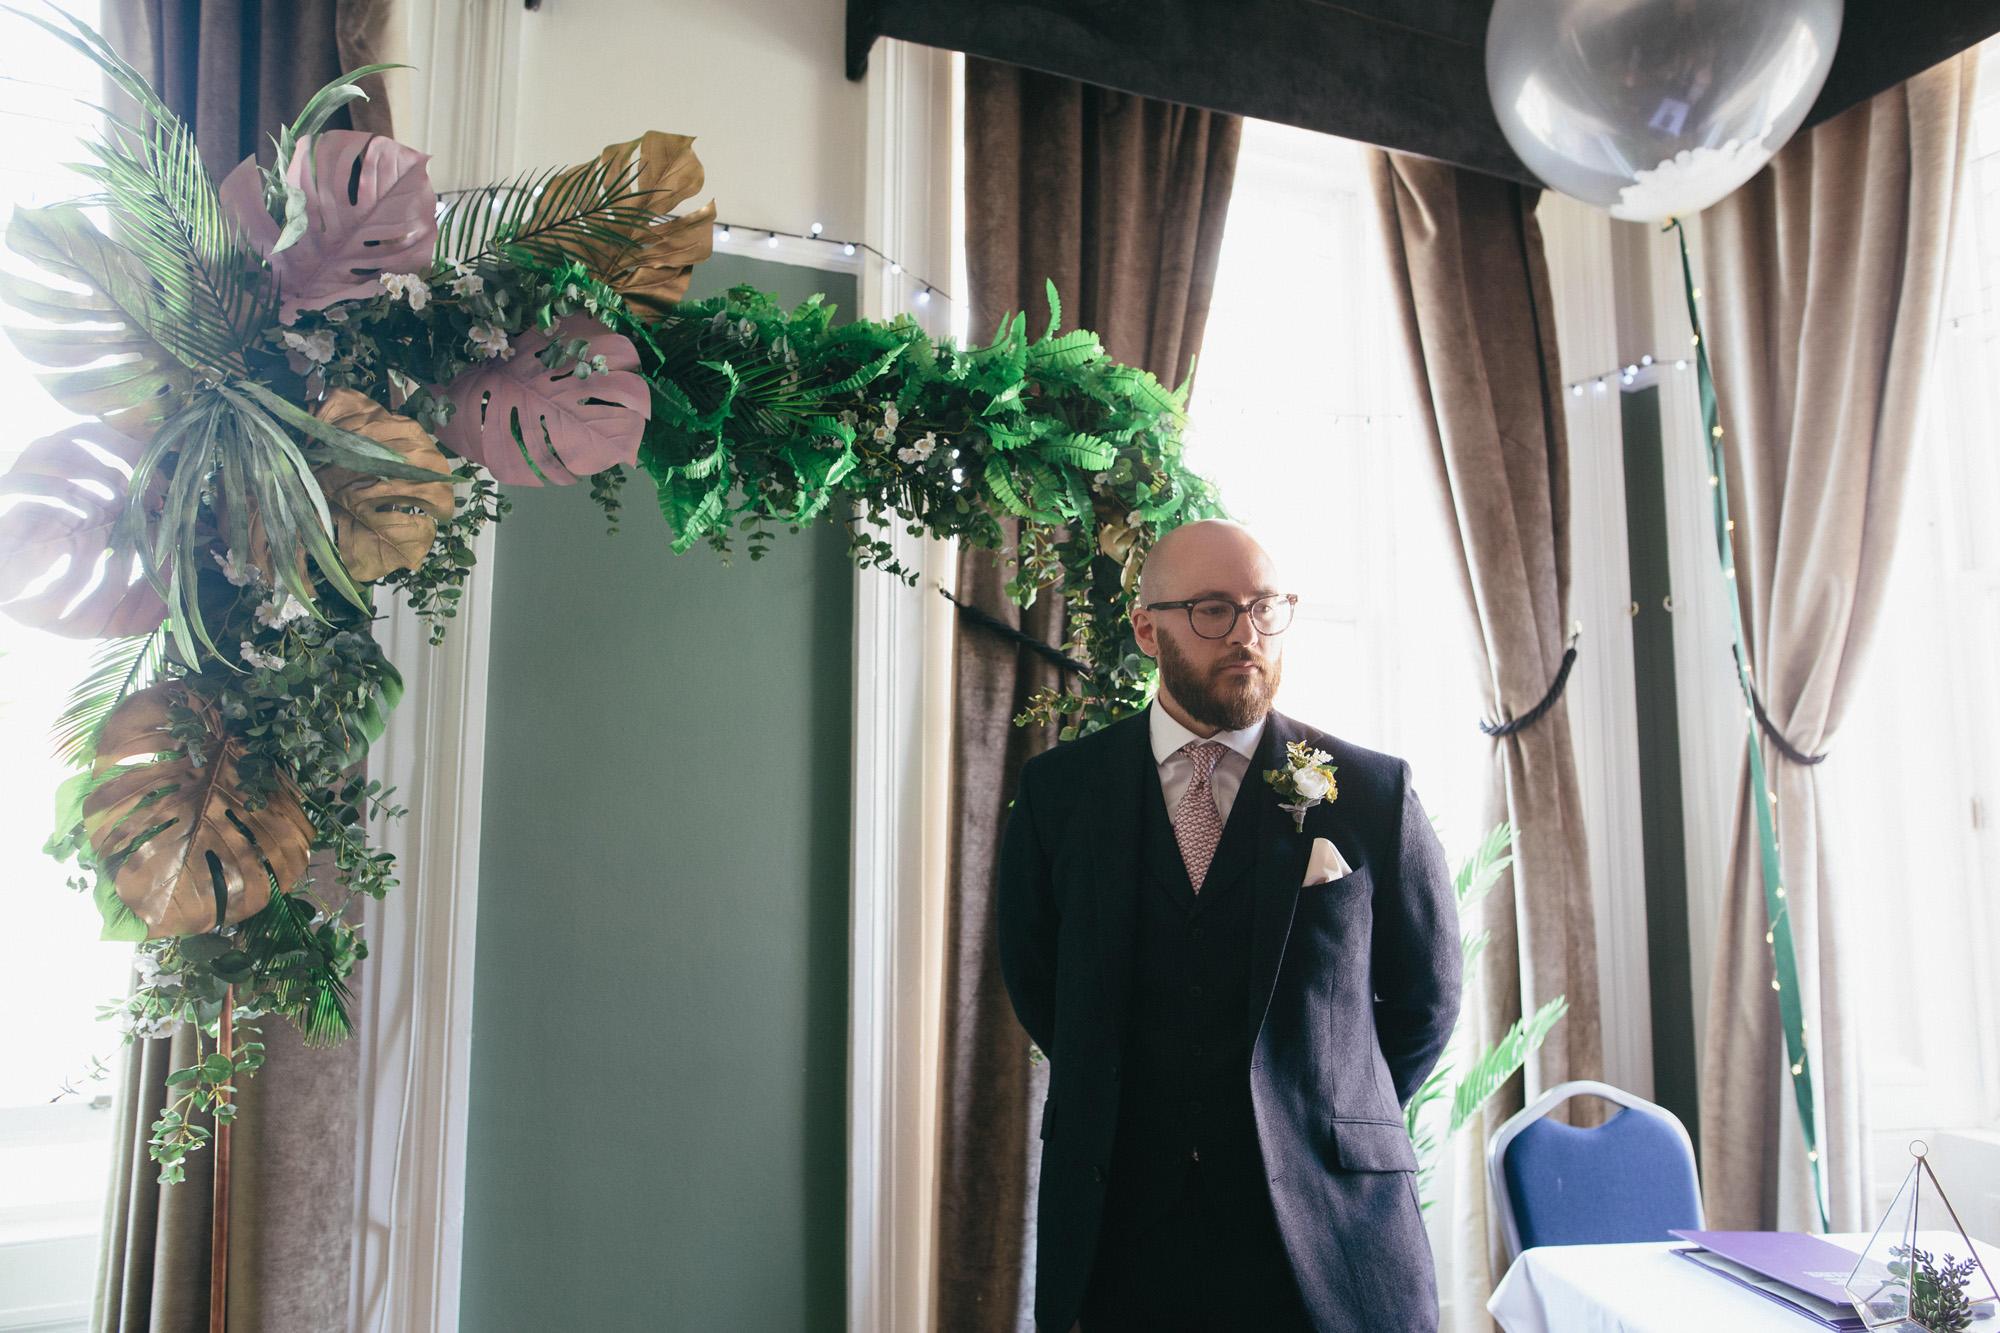 Quirky Wedding Photography Glasgow West End 020.jpg